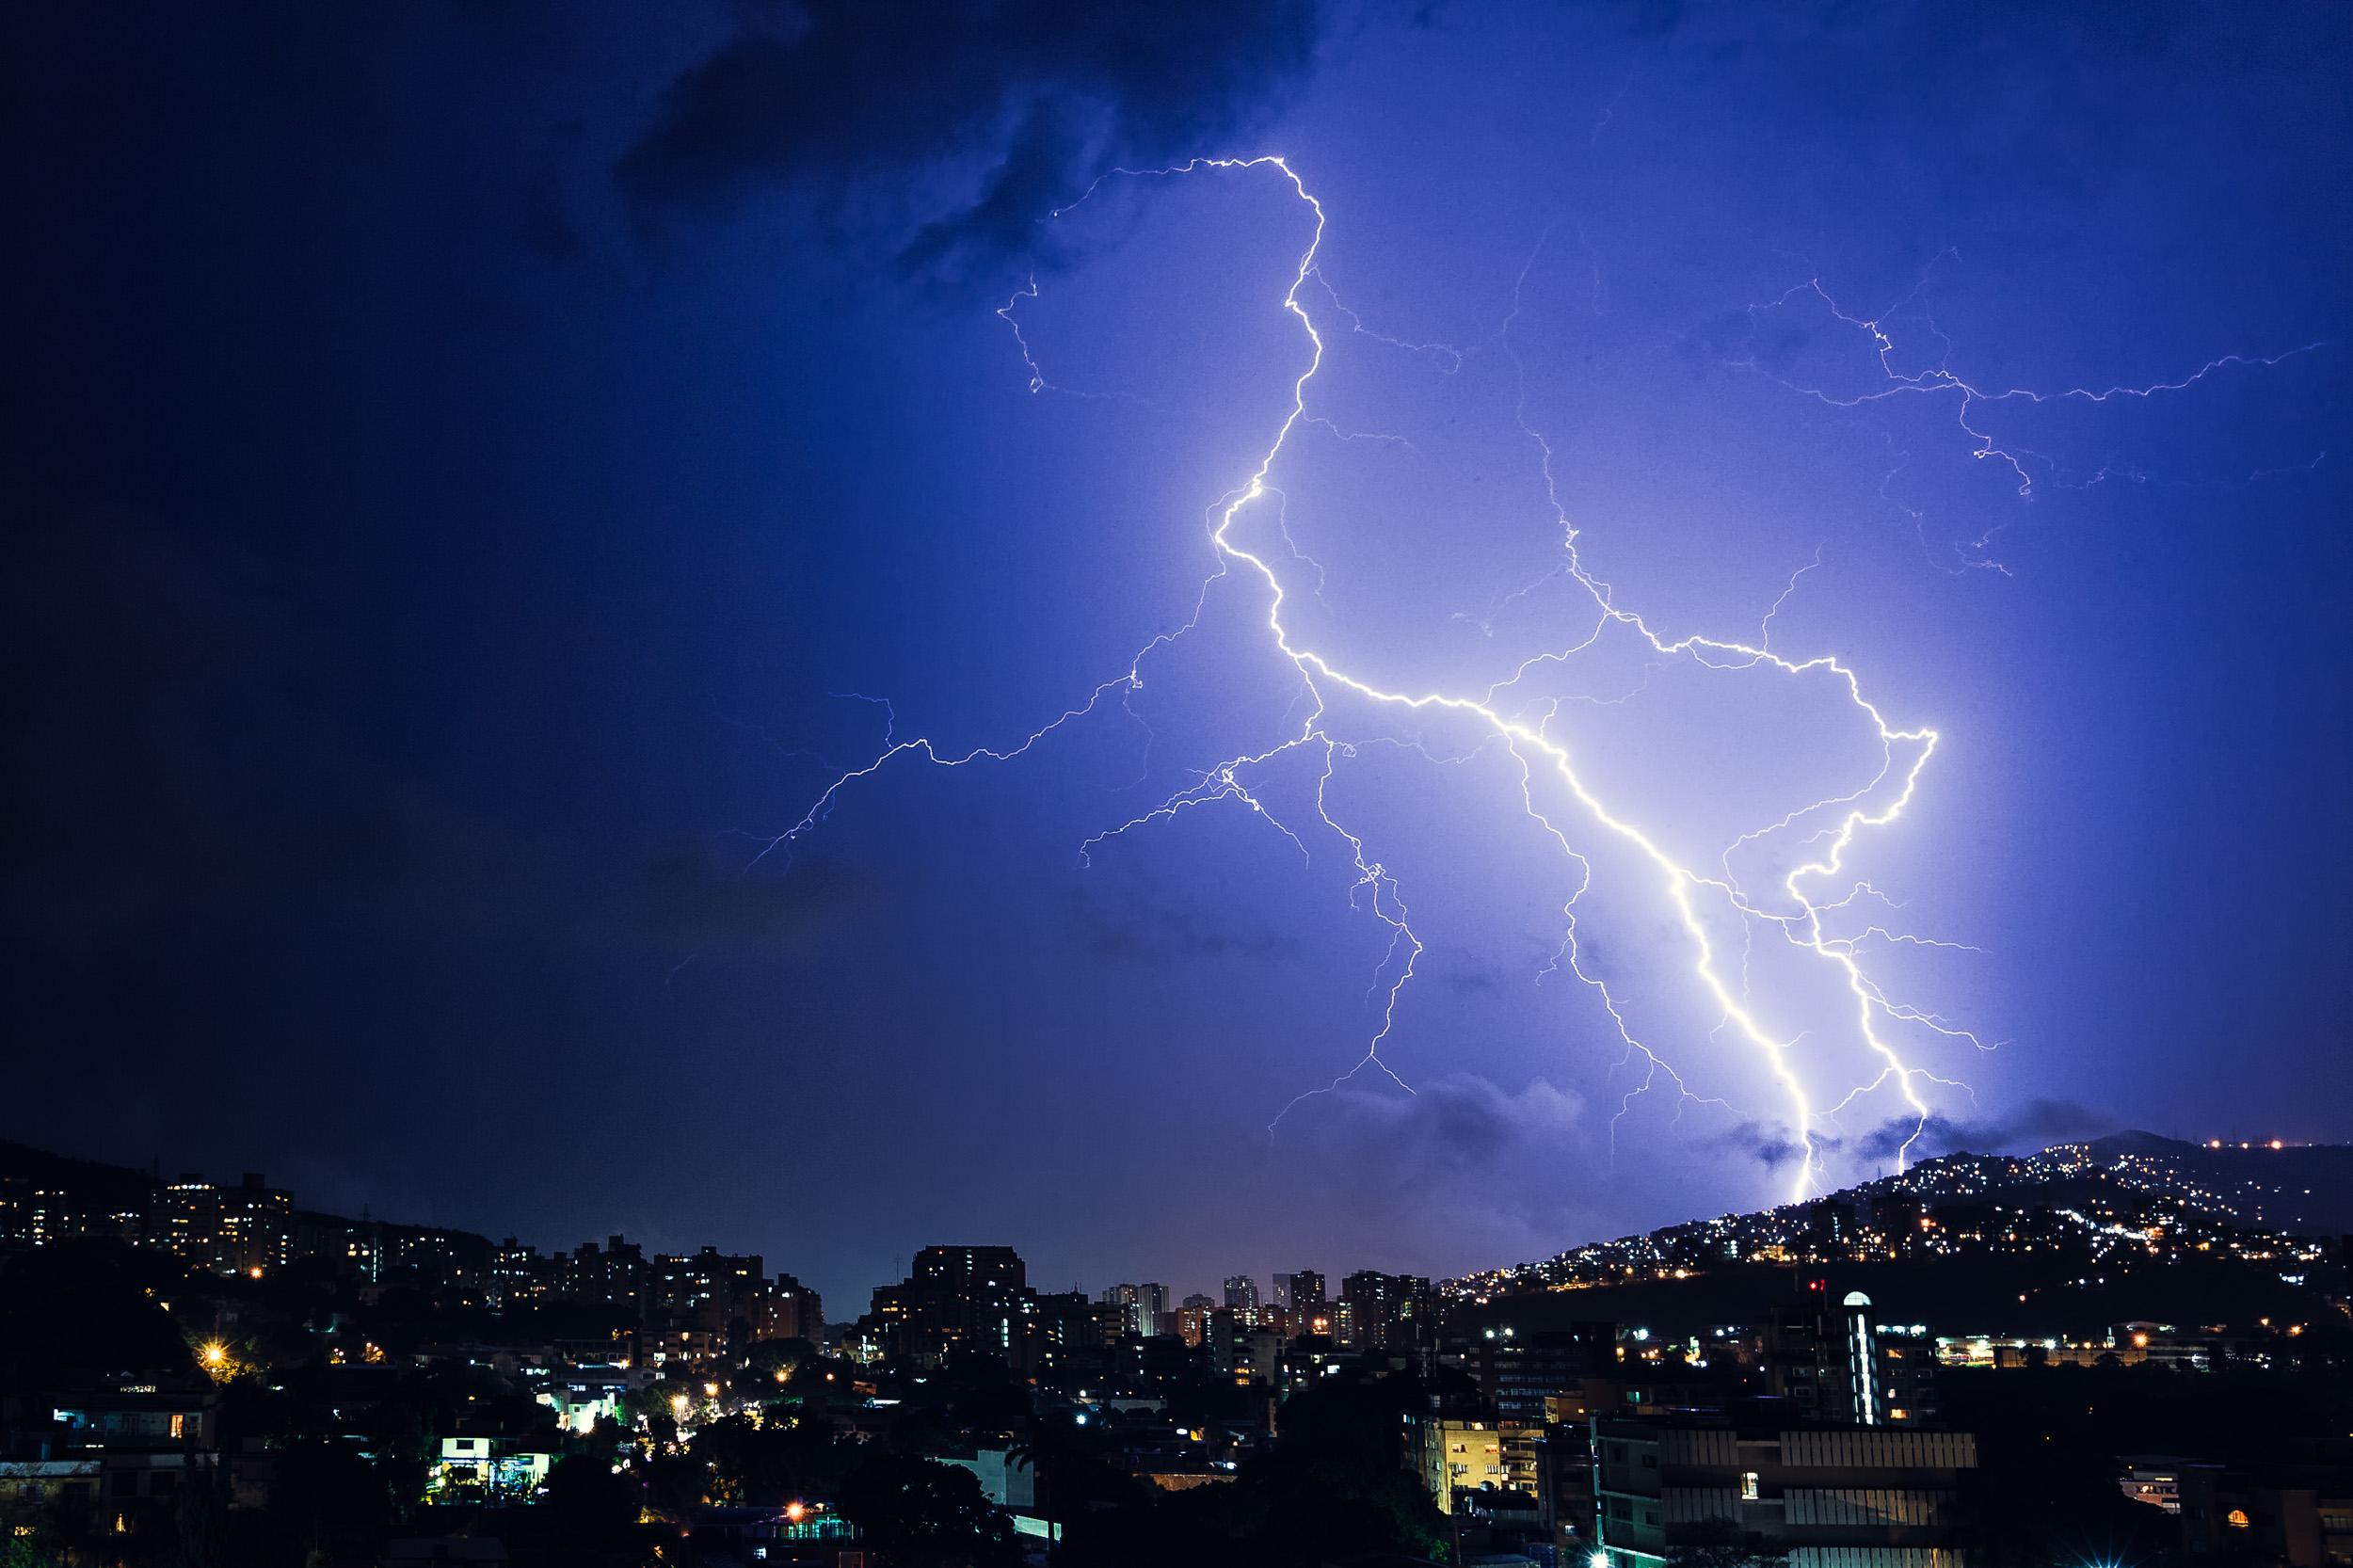 Caracas_Venezuela_lightning__Miami_Fort_Lauderdale_commercial_photographer_Franklin_Castillo.jpg